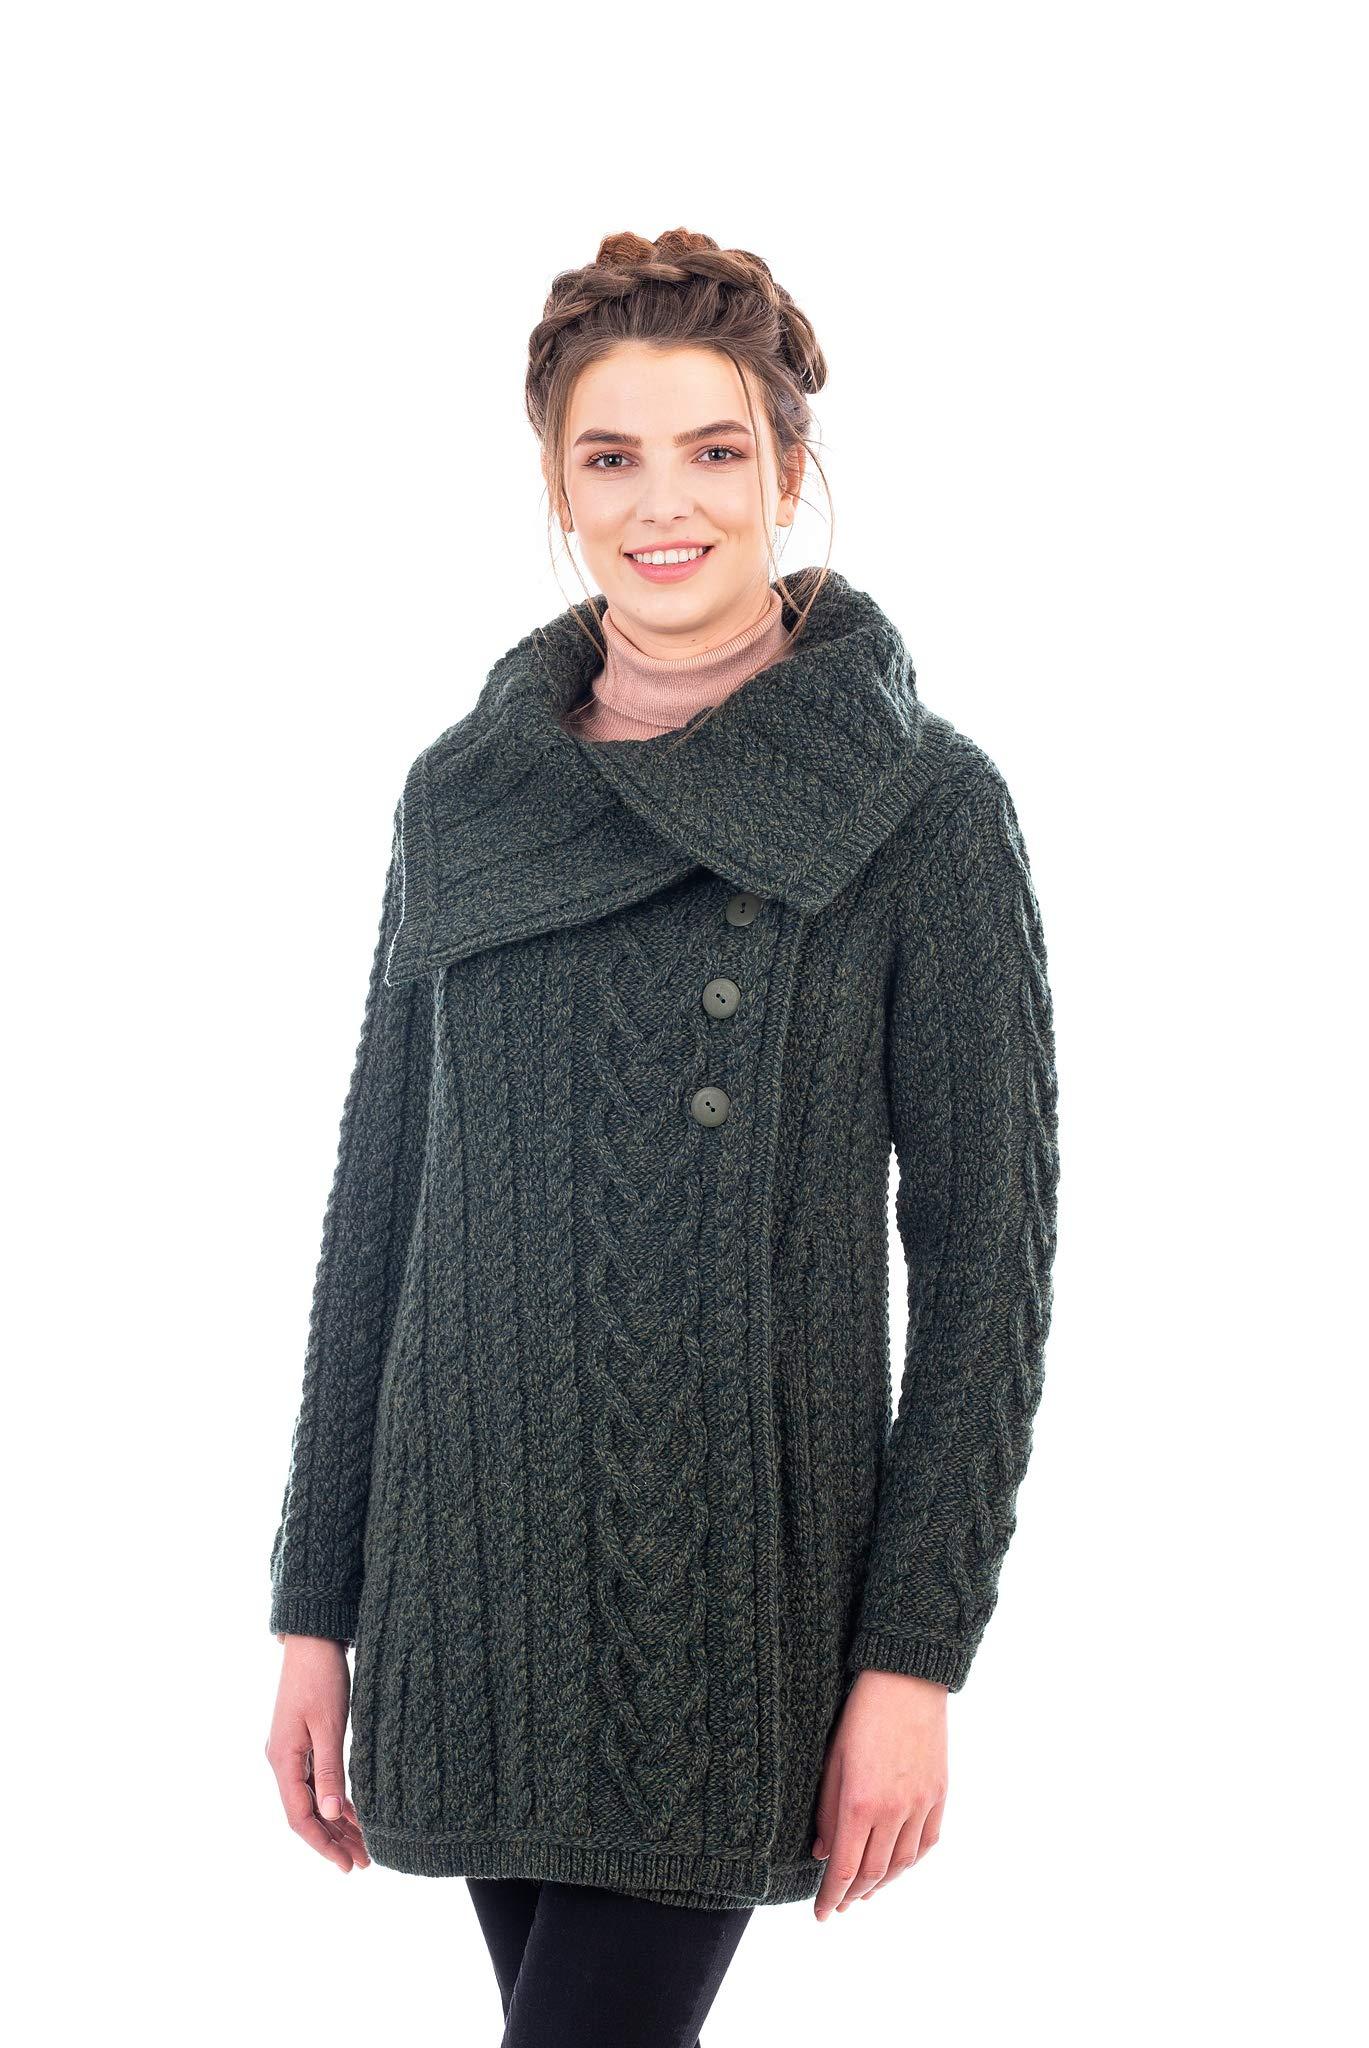 SAOL 100% Merino Wool Women Classic Cable Knit Cardigan Irish Coat with Pockets